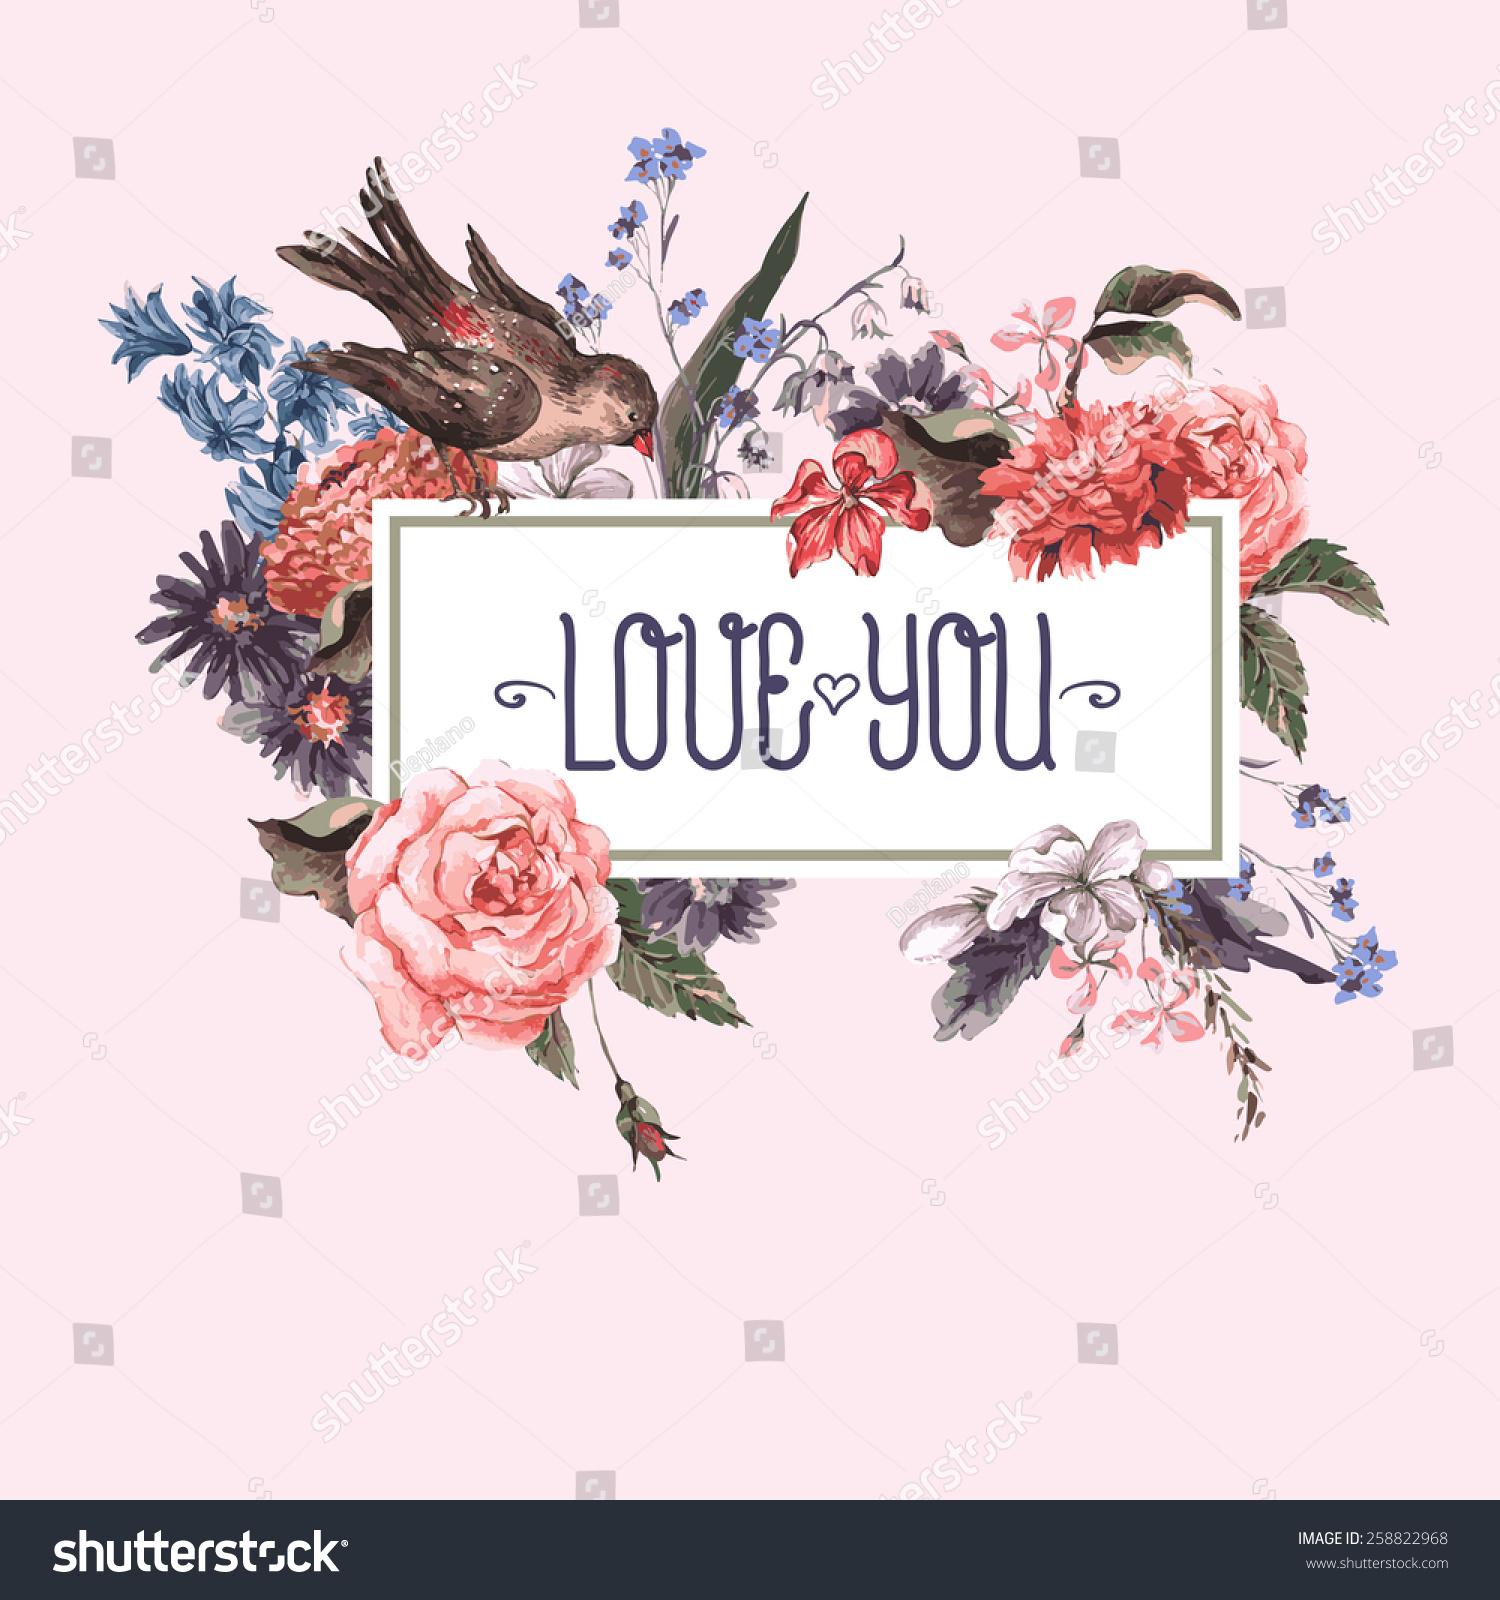 Image Result For Greeting Cards Online